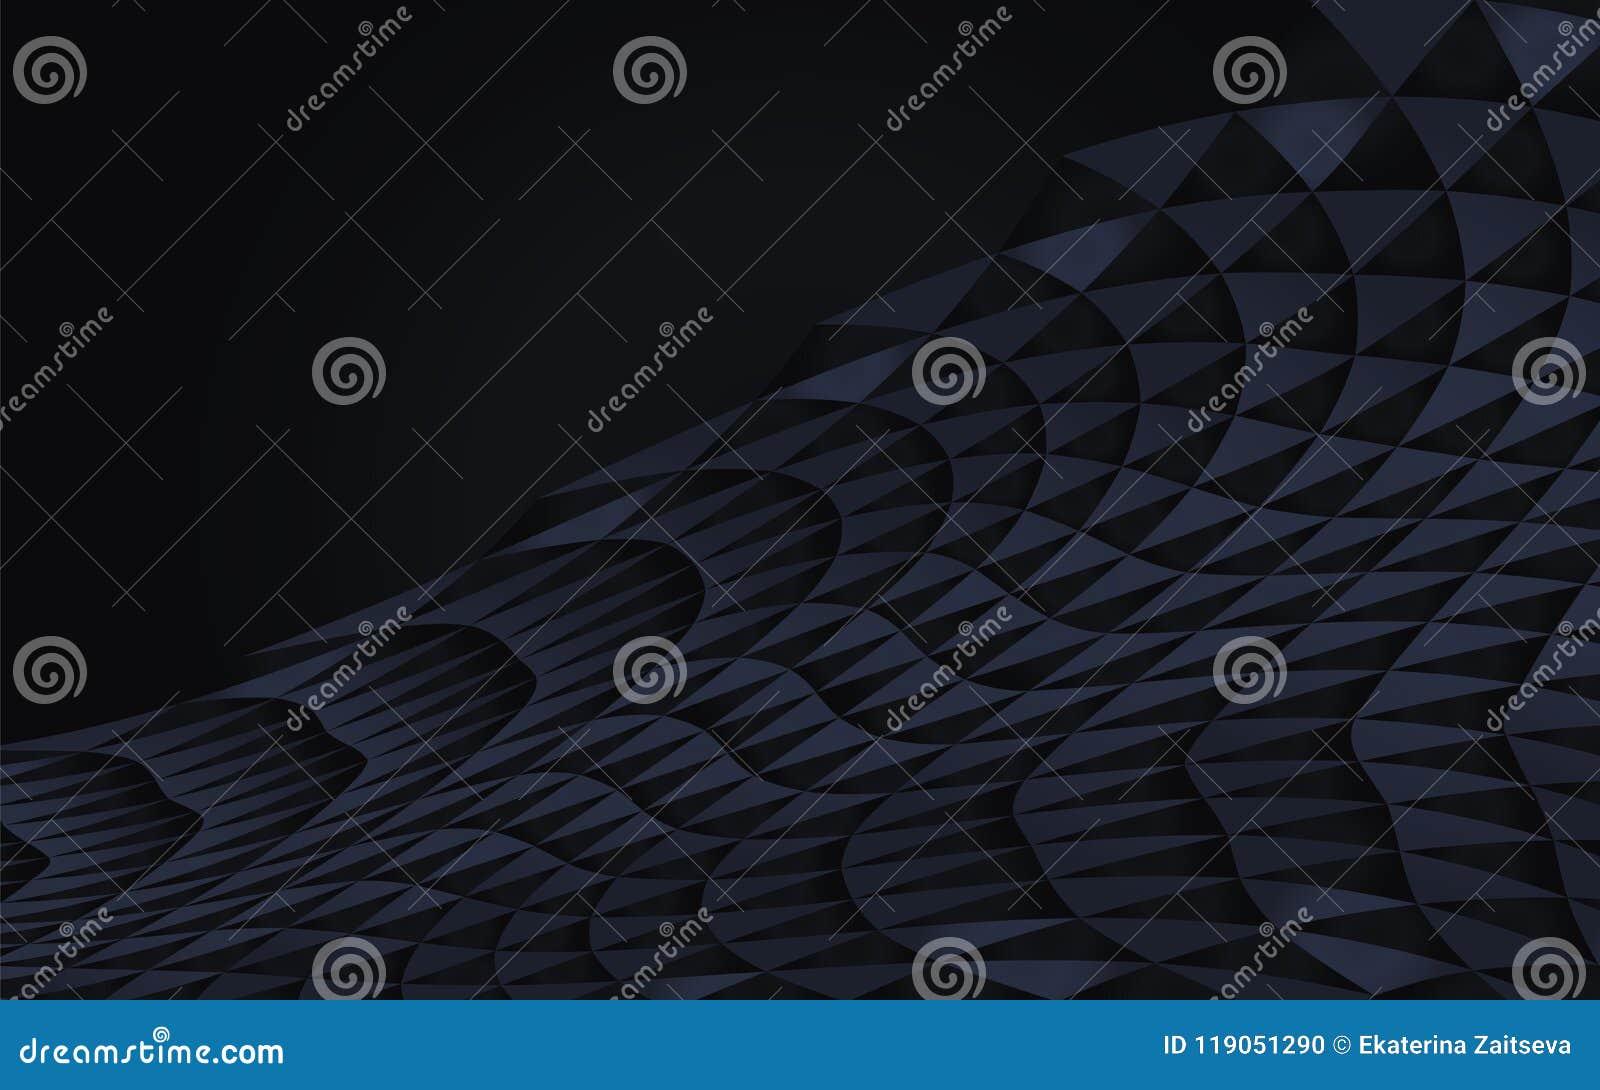 Dunkelblaues abstraktes geometrisches gekurvt vom Dreieckvektor hob Element-Gegenstandde des Halbschattenschwarzwellenschattenvol